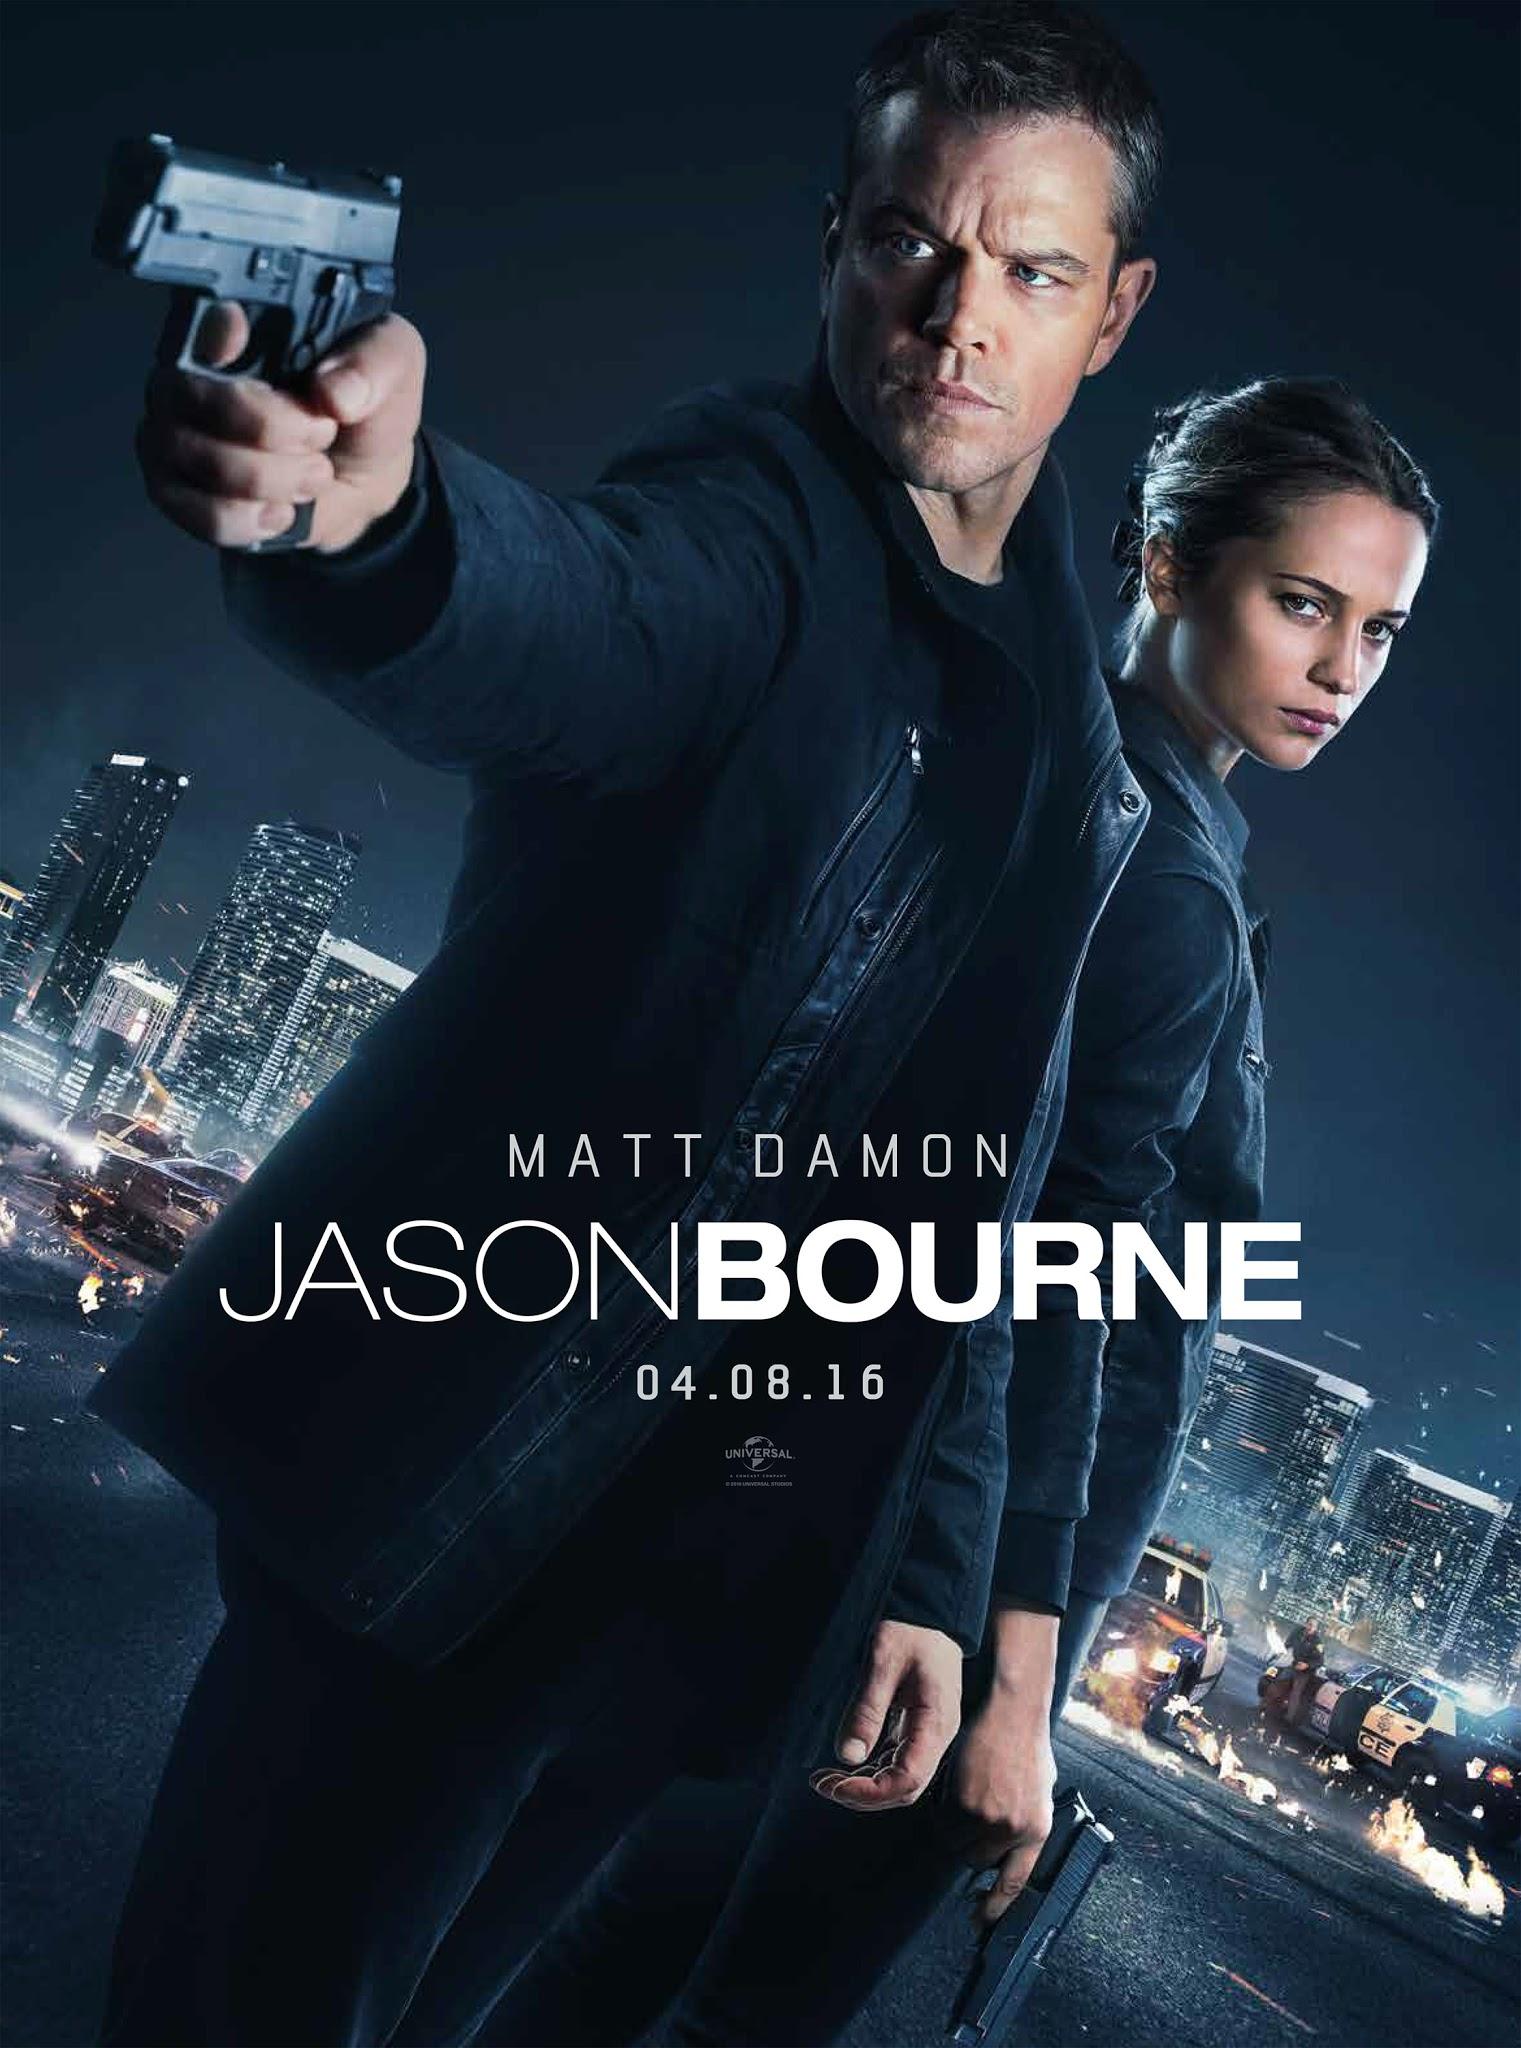 Ver Jason Bourne Online (2016) Gratis HD Pelicula Completa